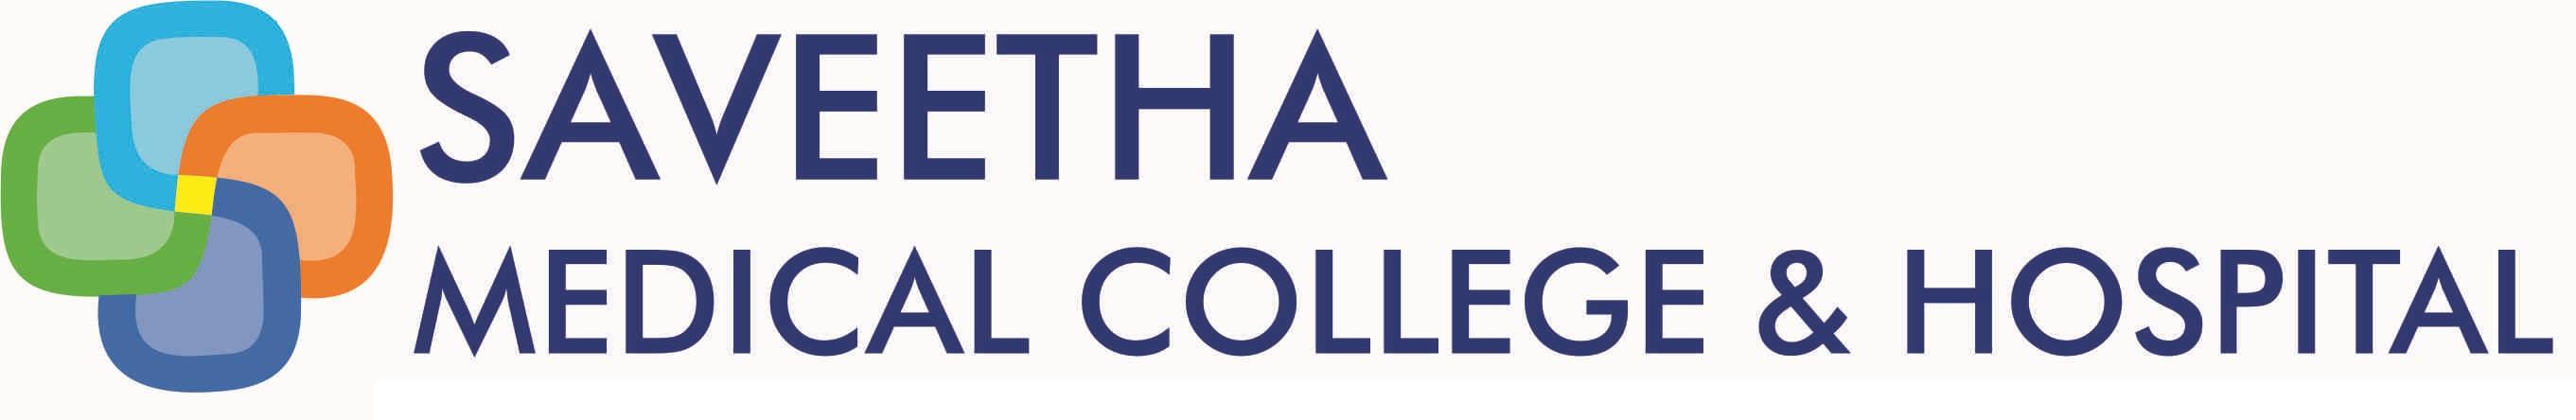 Saveetha Medical College Hospital